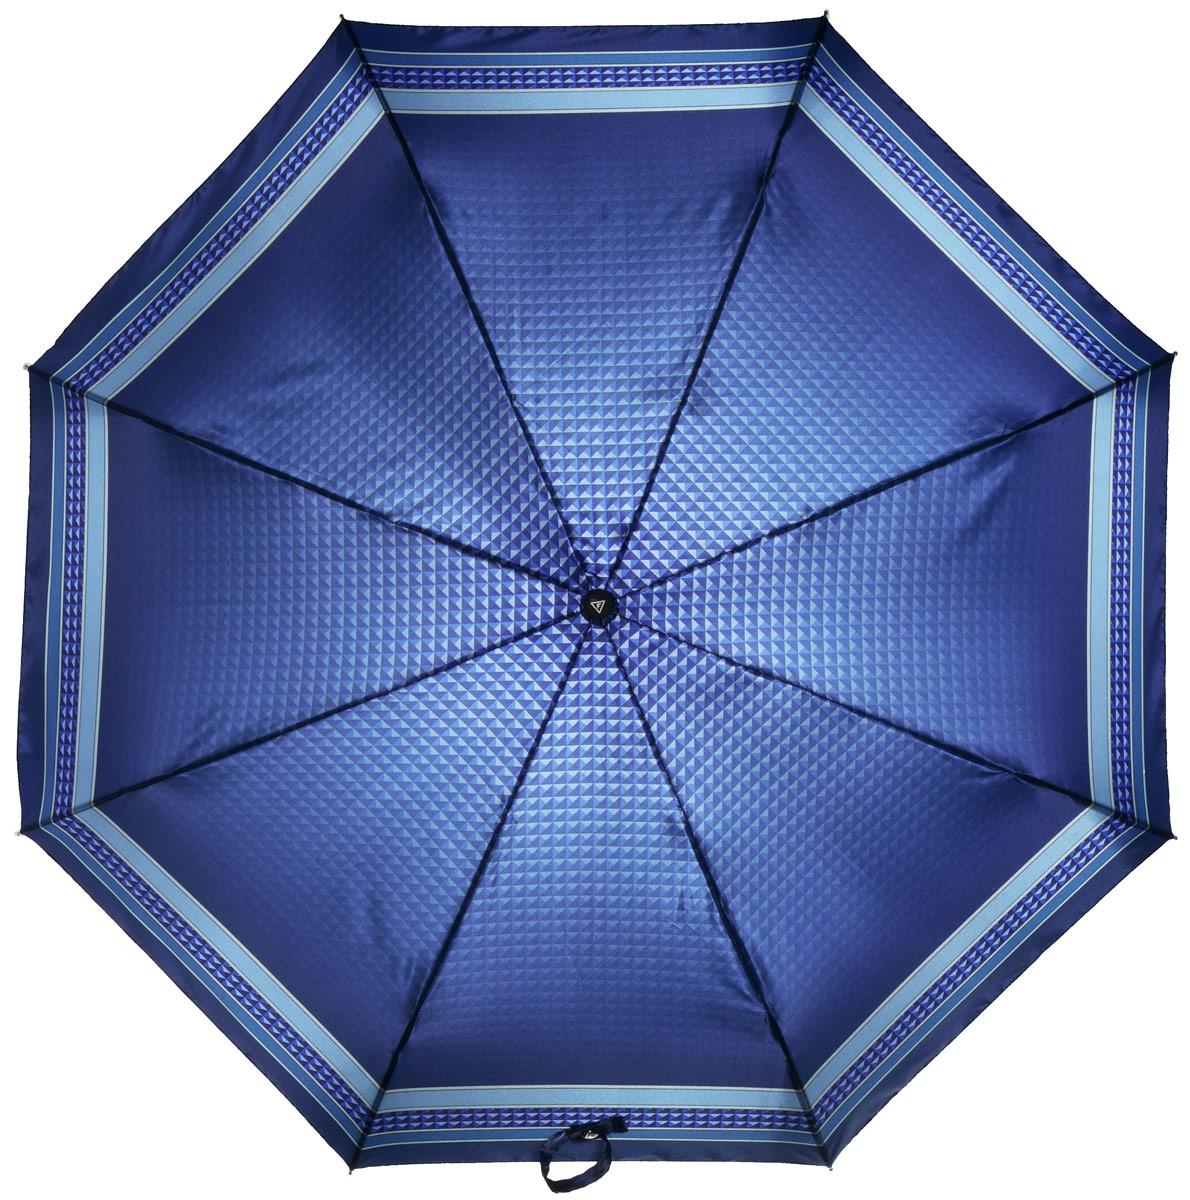 Зонт женский Fabretti, автомат, 3 сложения, цвет: серый. L-16105-14L-16105-14Зонт женский Fabretti, облегченный суперавтомат, 3 сложения